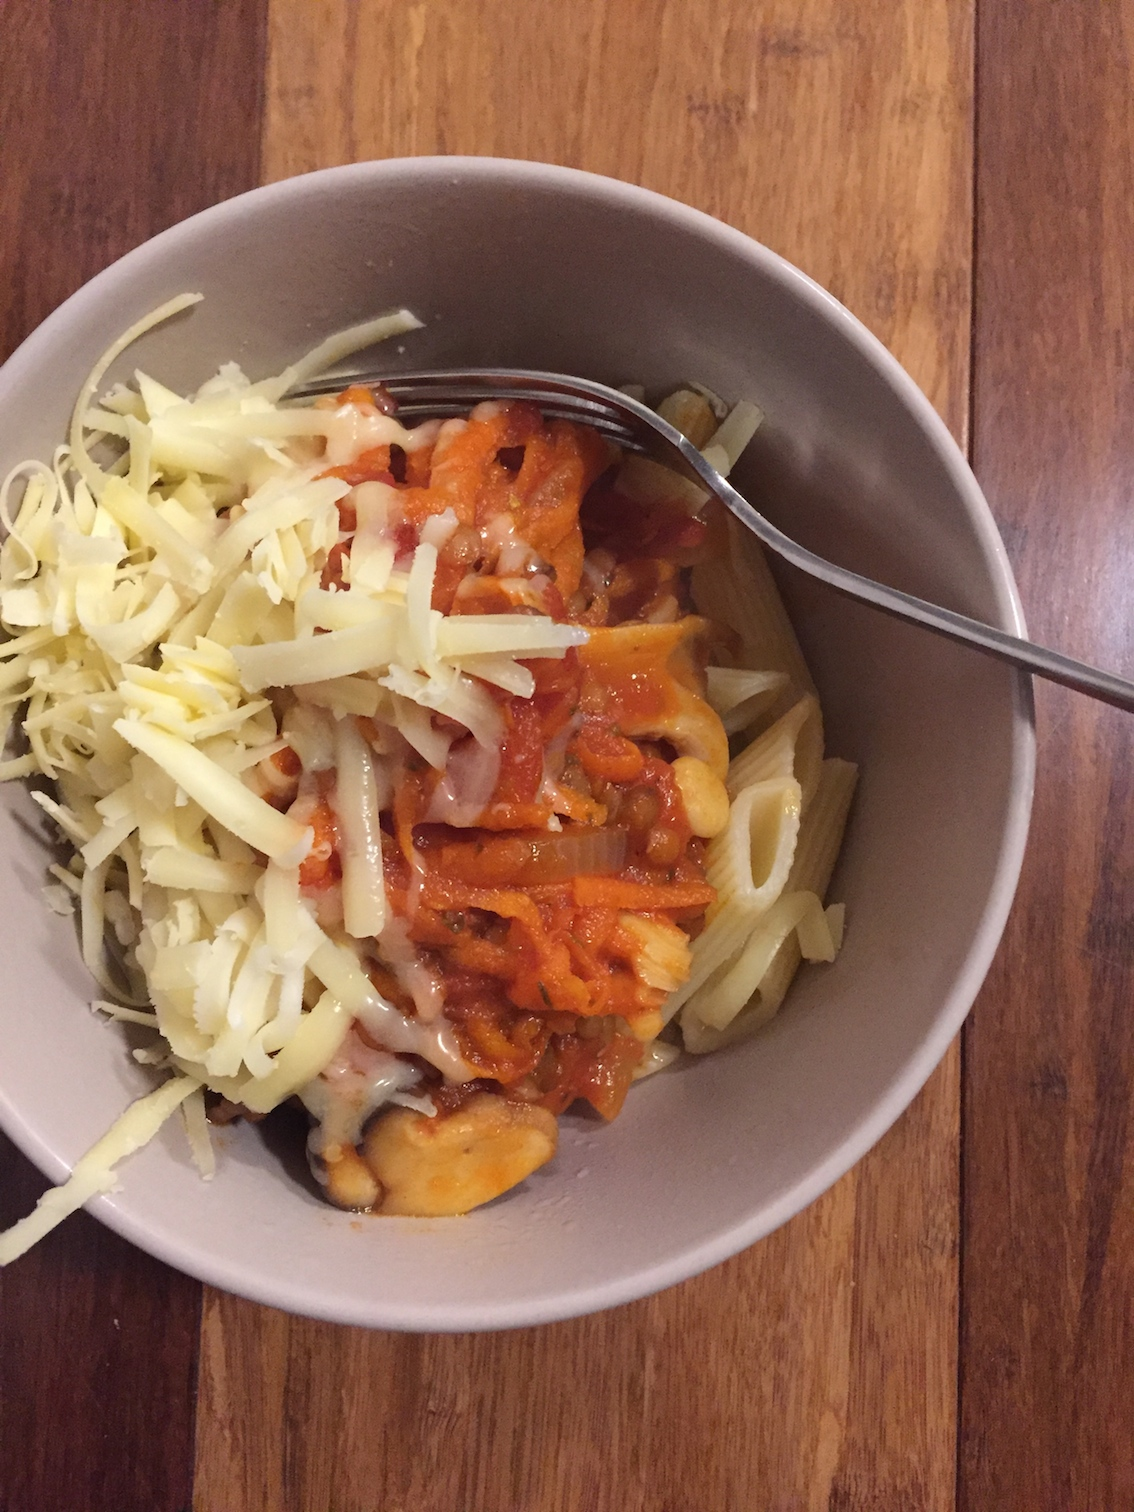 Lentil, mushroom, chilli pasta